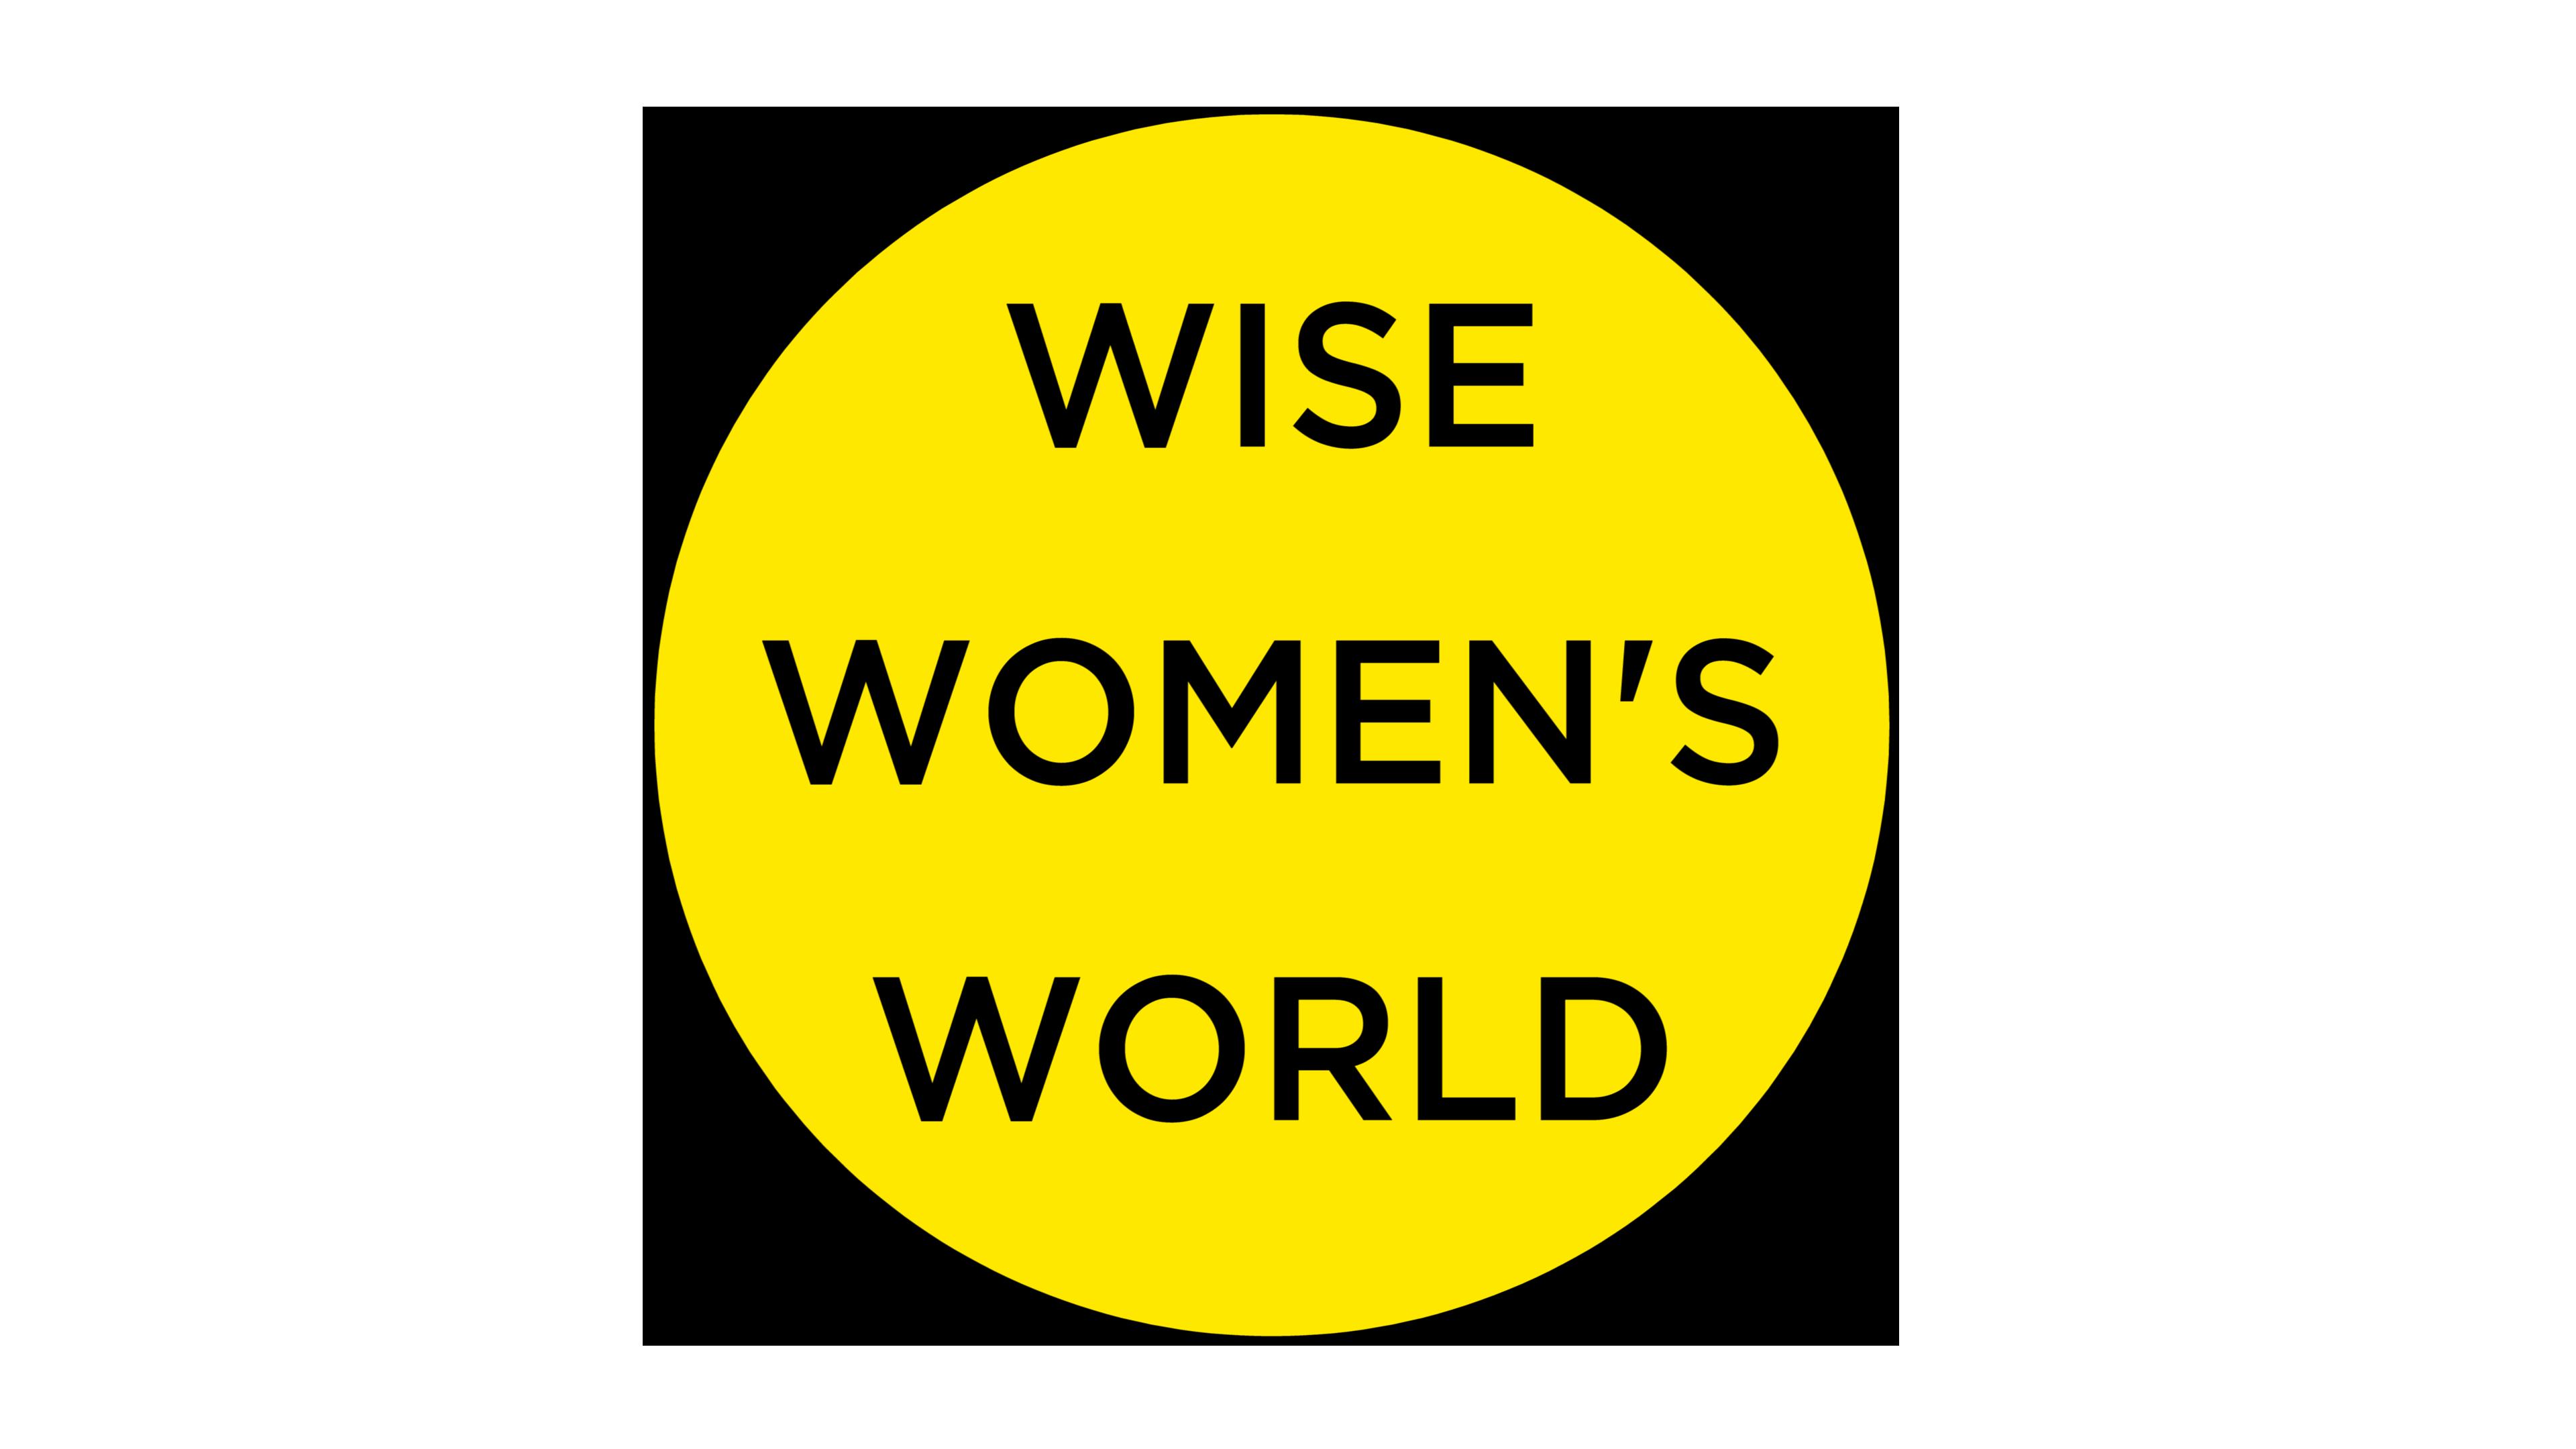 Wise Women's World